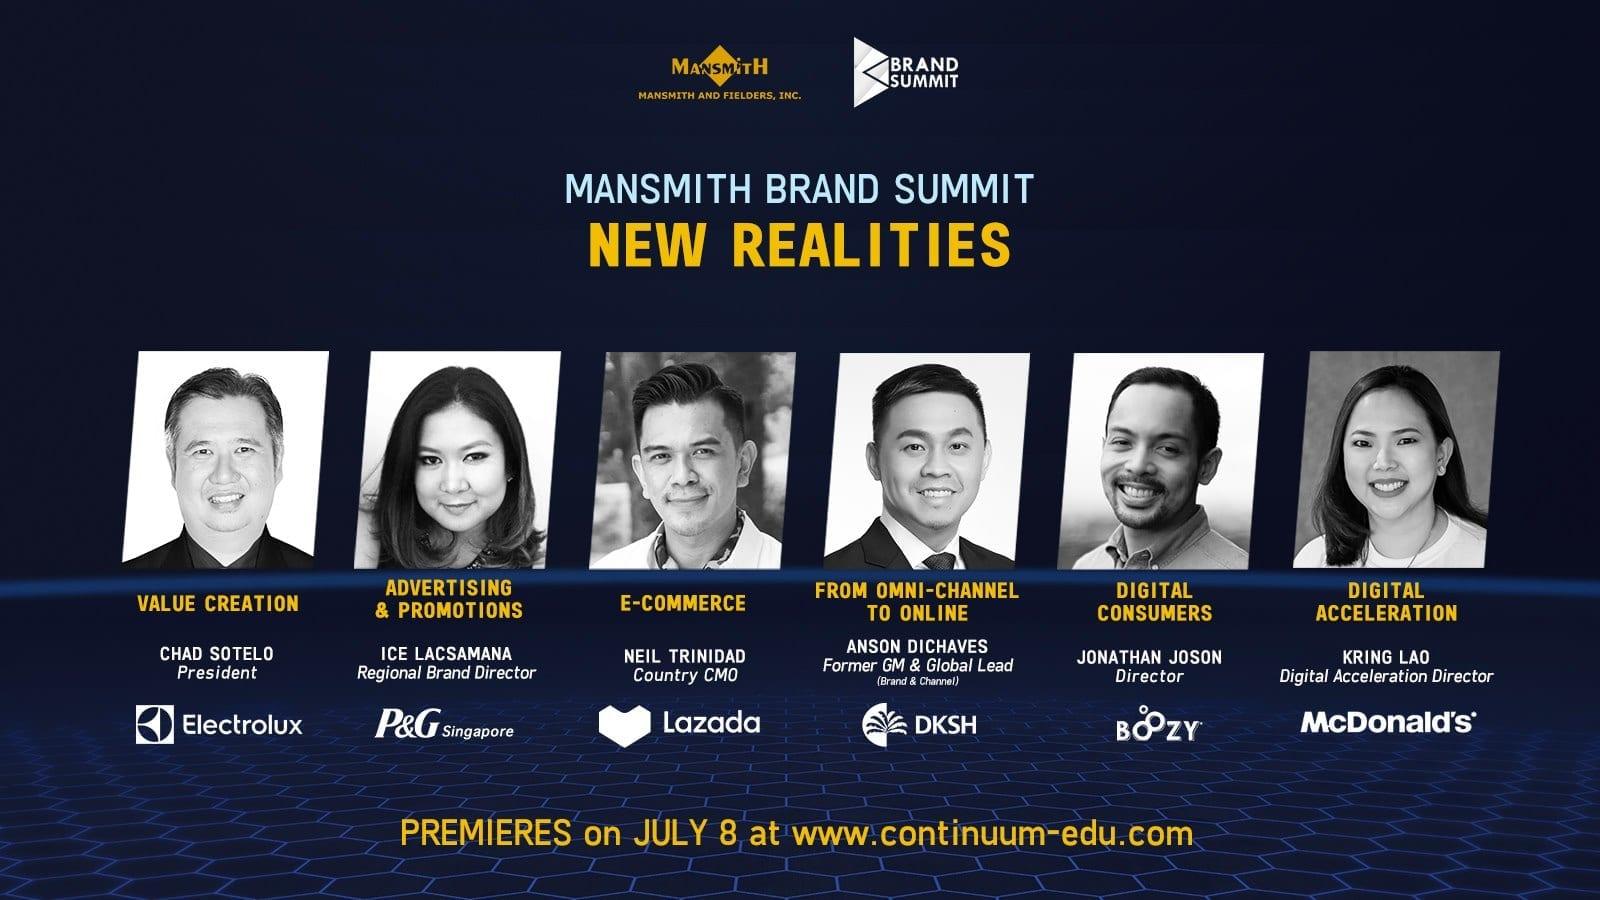 New Realities in Marketing